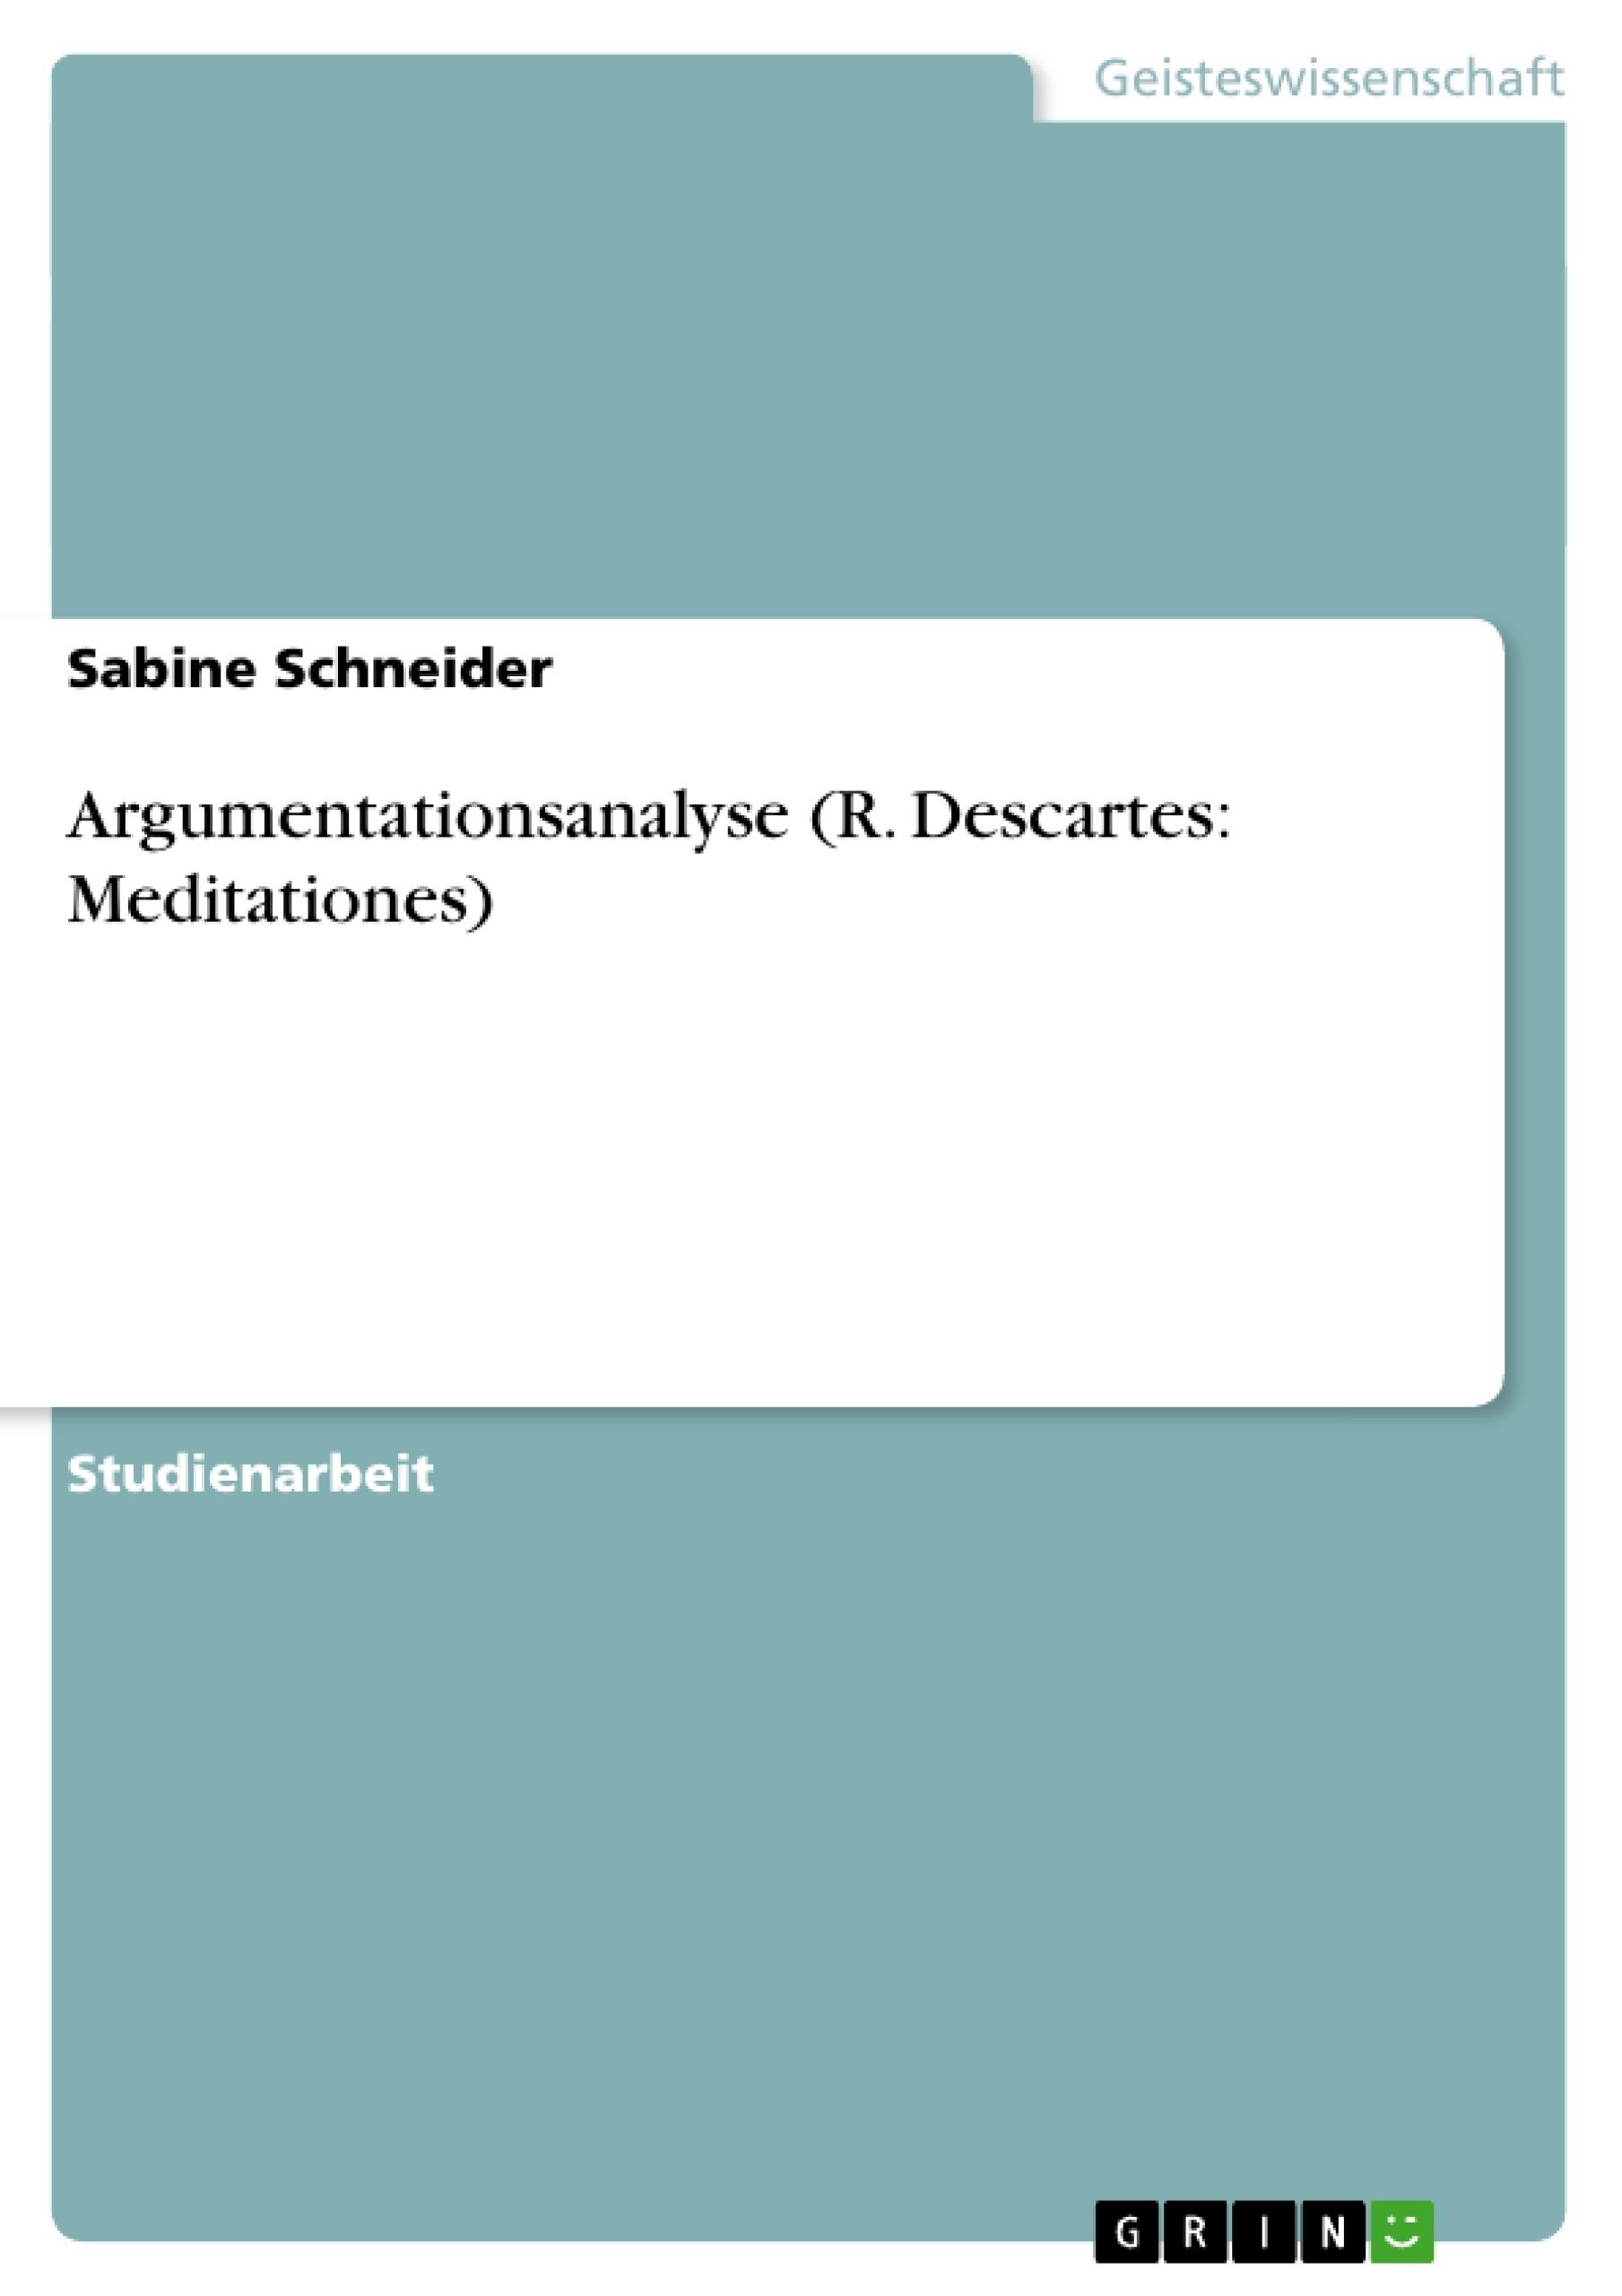 Titel: Argumentationsanalyse (R. Descartes: Meditationes)